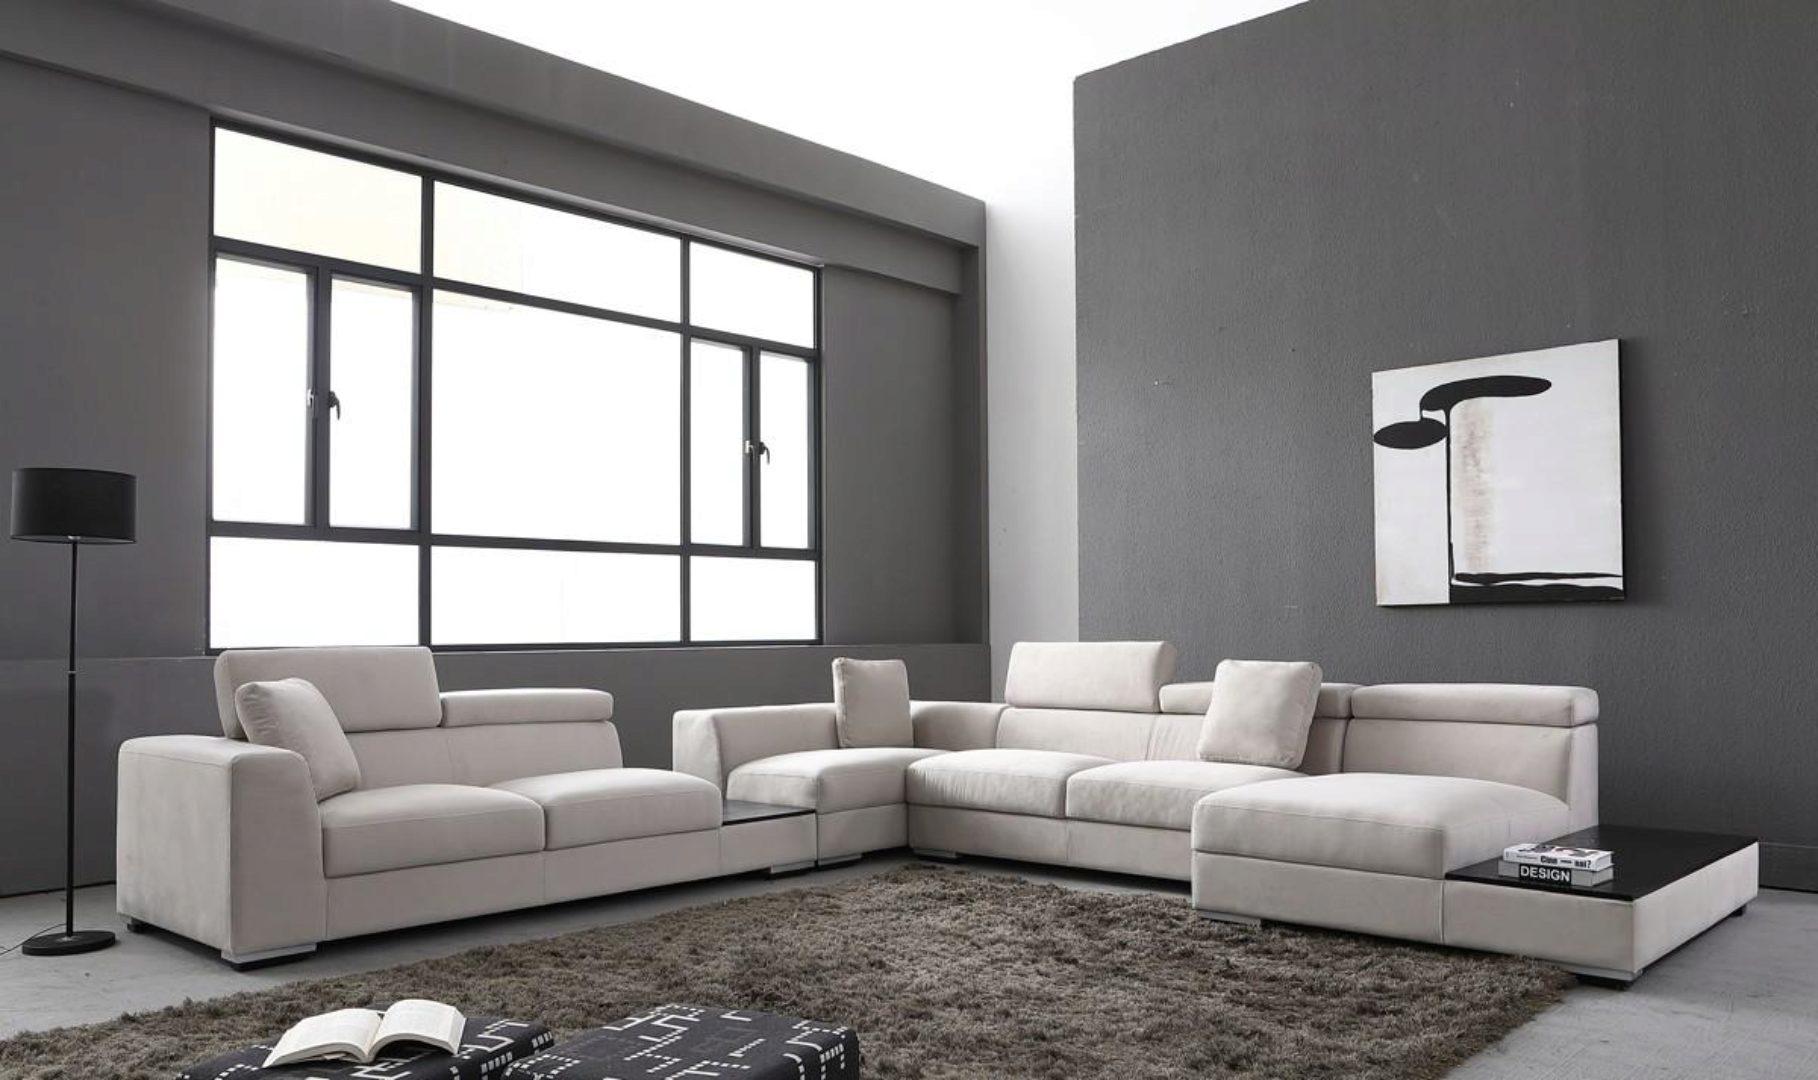 soflex aurora ultra modern gray microfiber modular sectional sofa right chaise